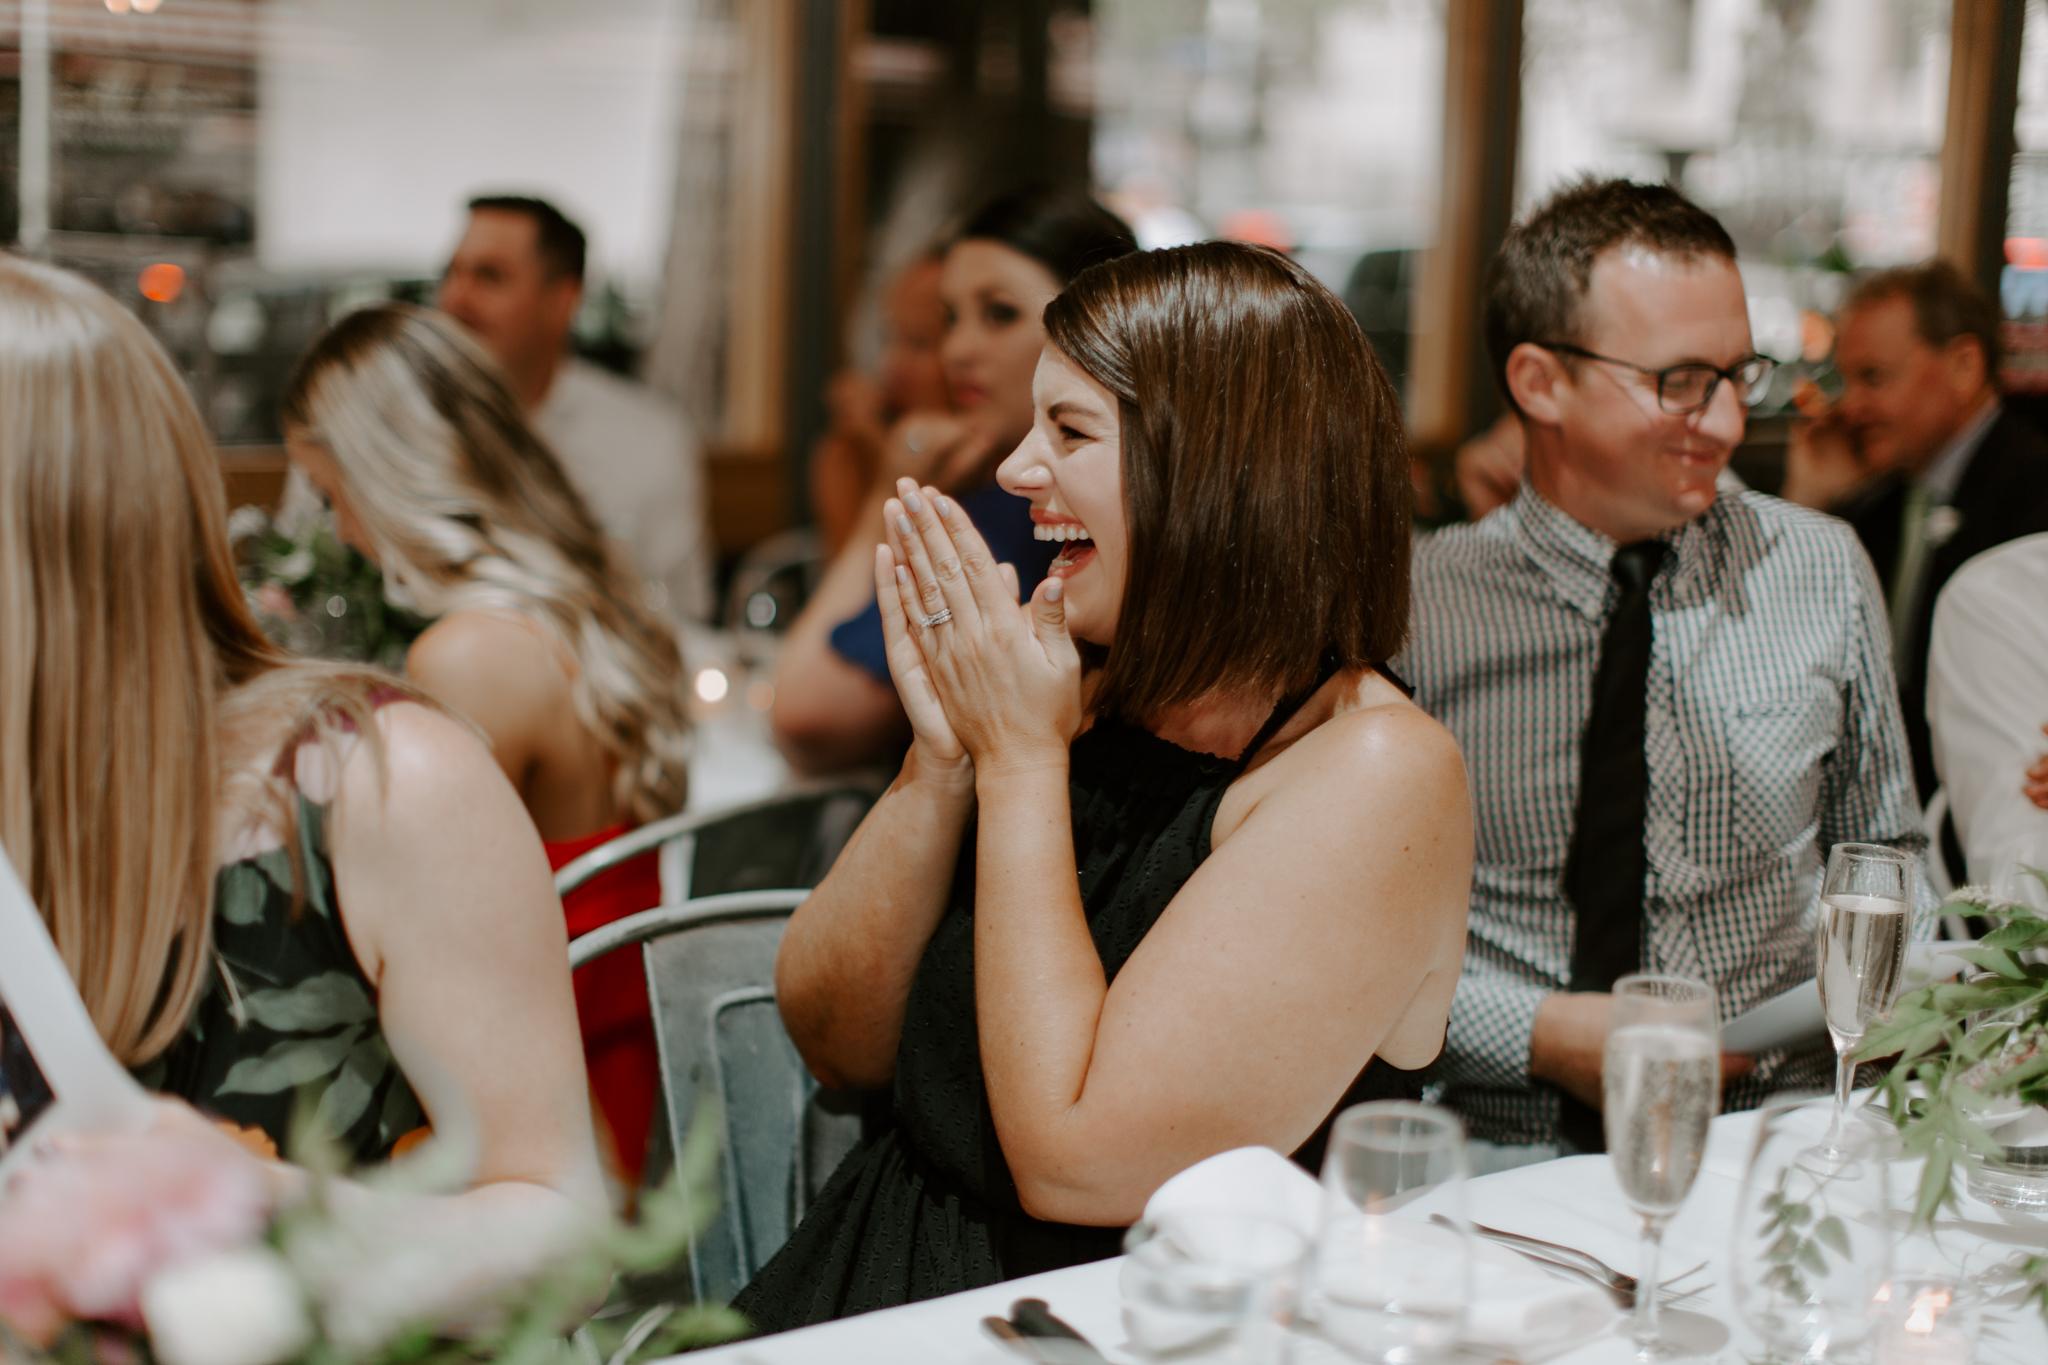 Trunk-restaurant-wedding-EmotionsandMath-075.jpg